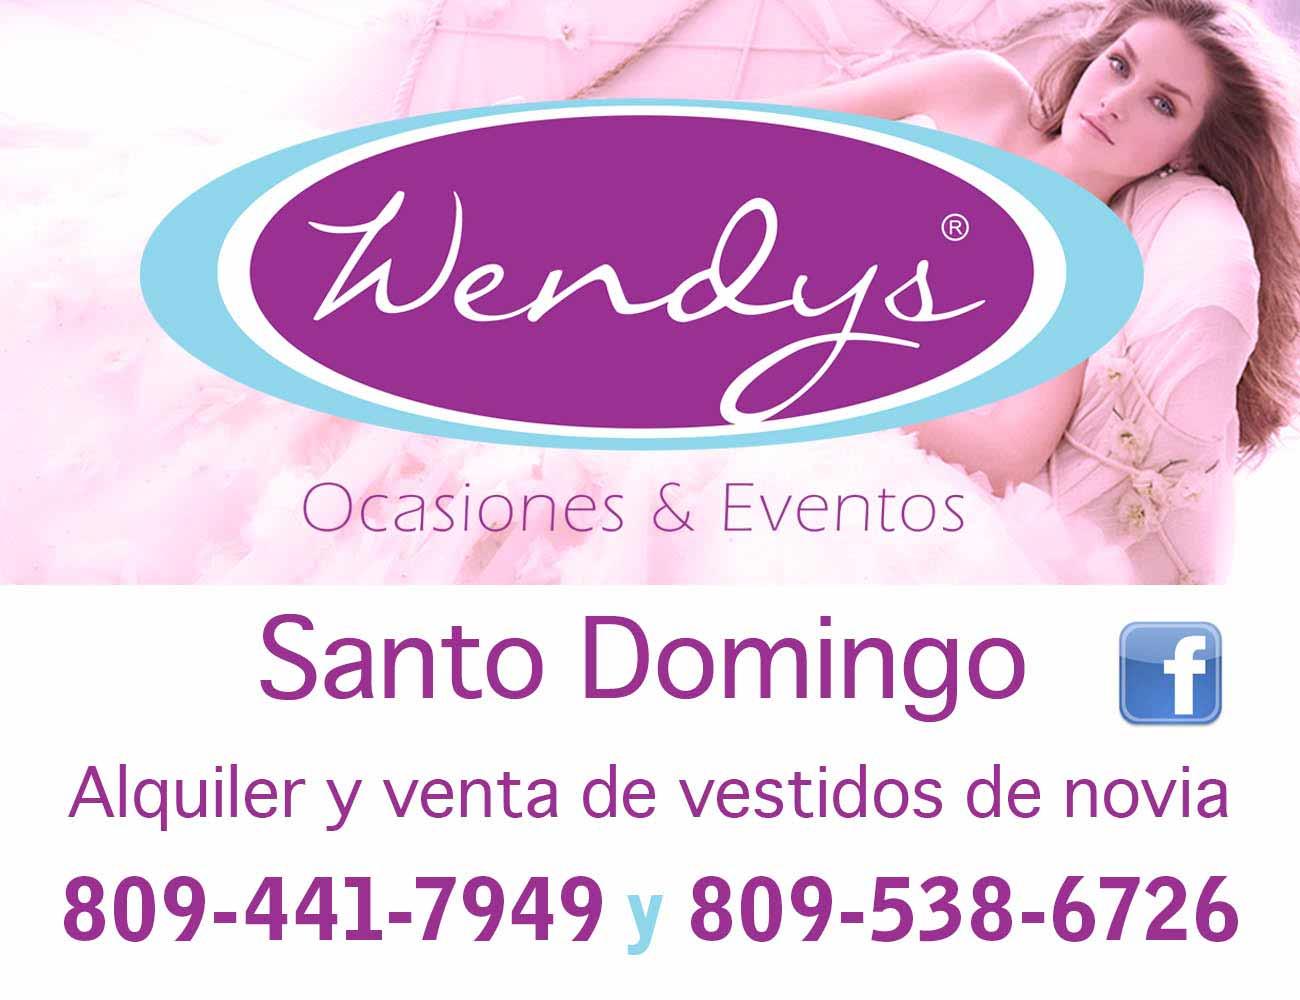 Exelent Alquiler De Vestido De Novia Image Collection - Wedding ...